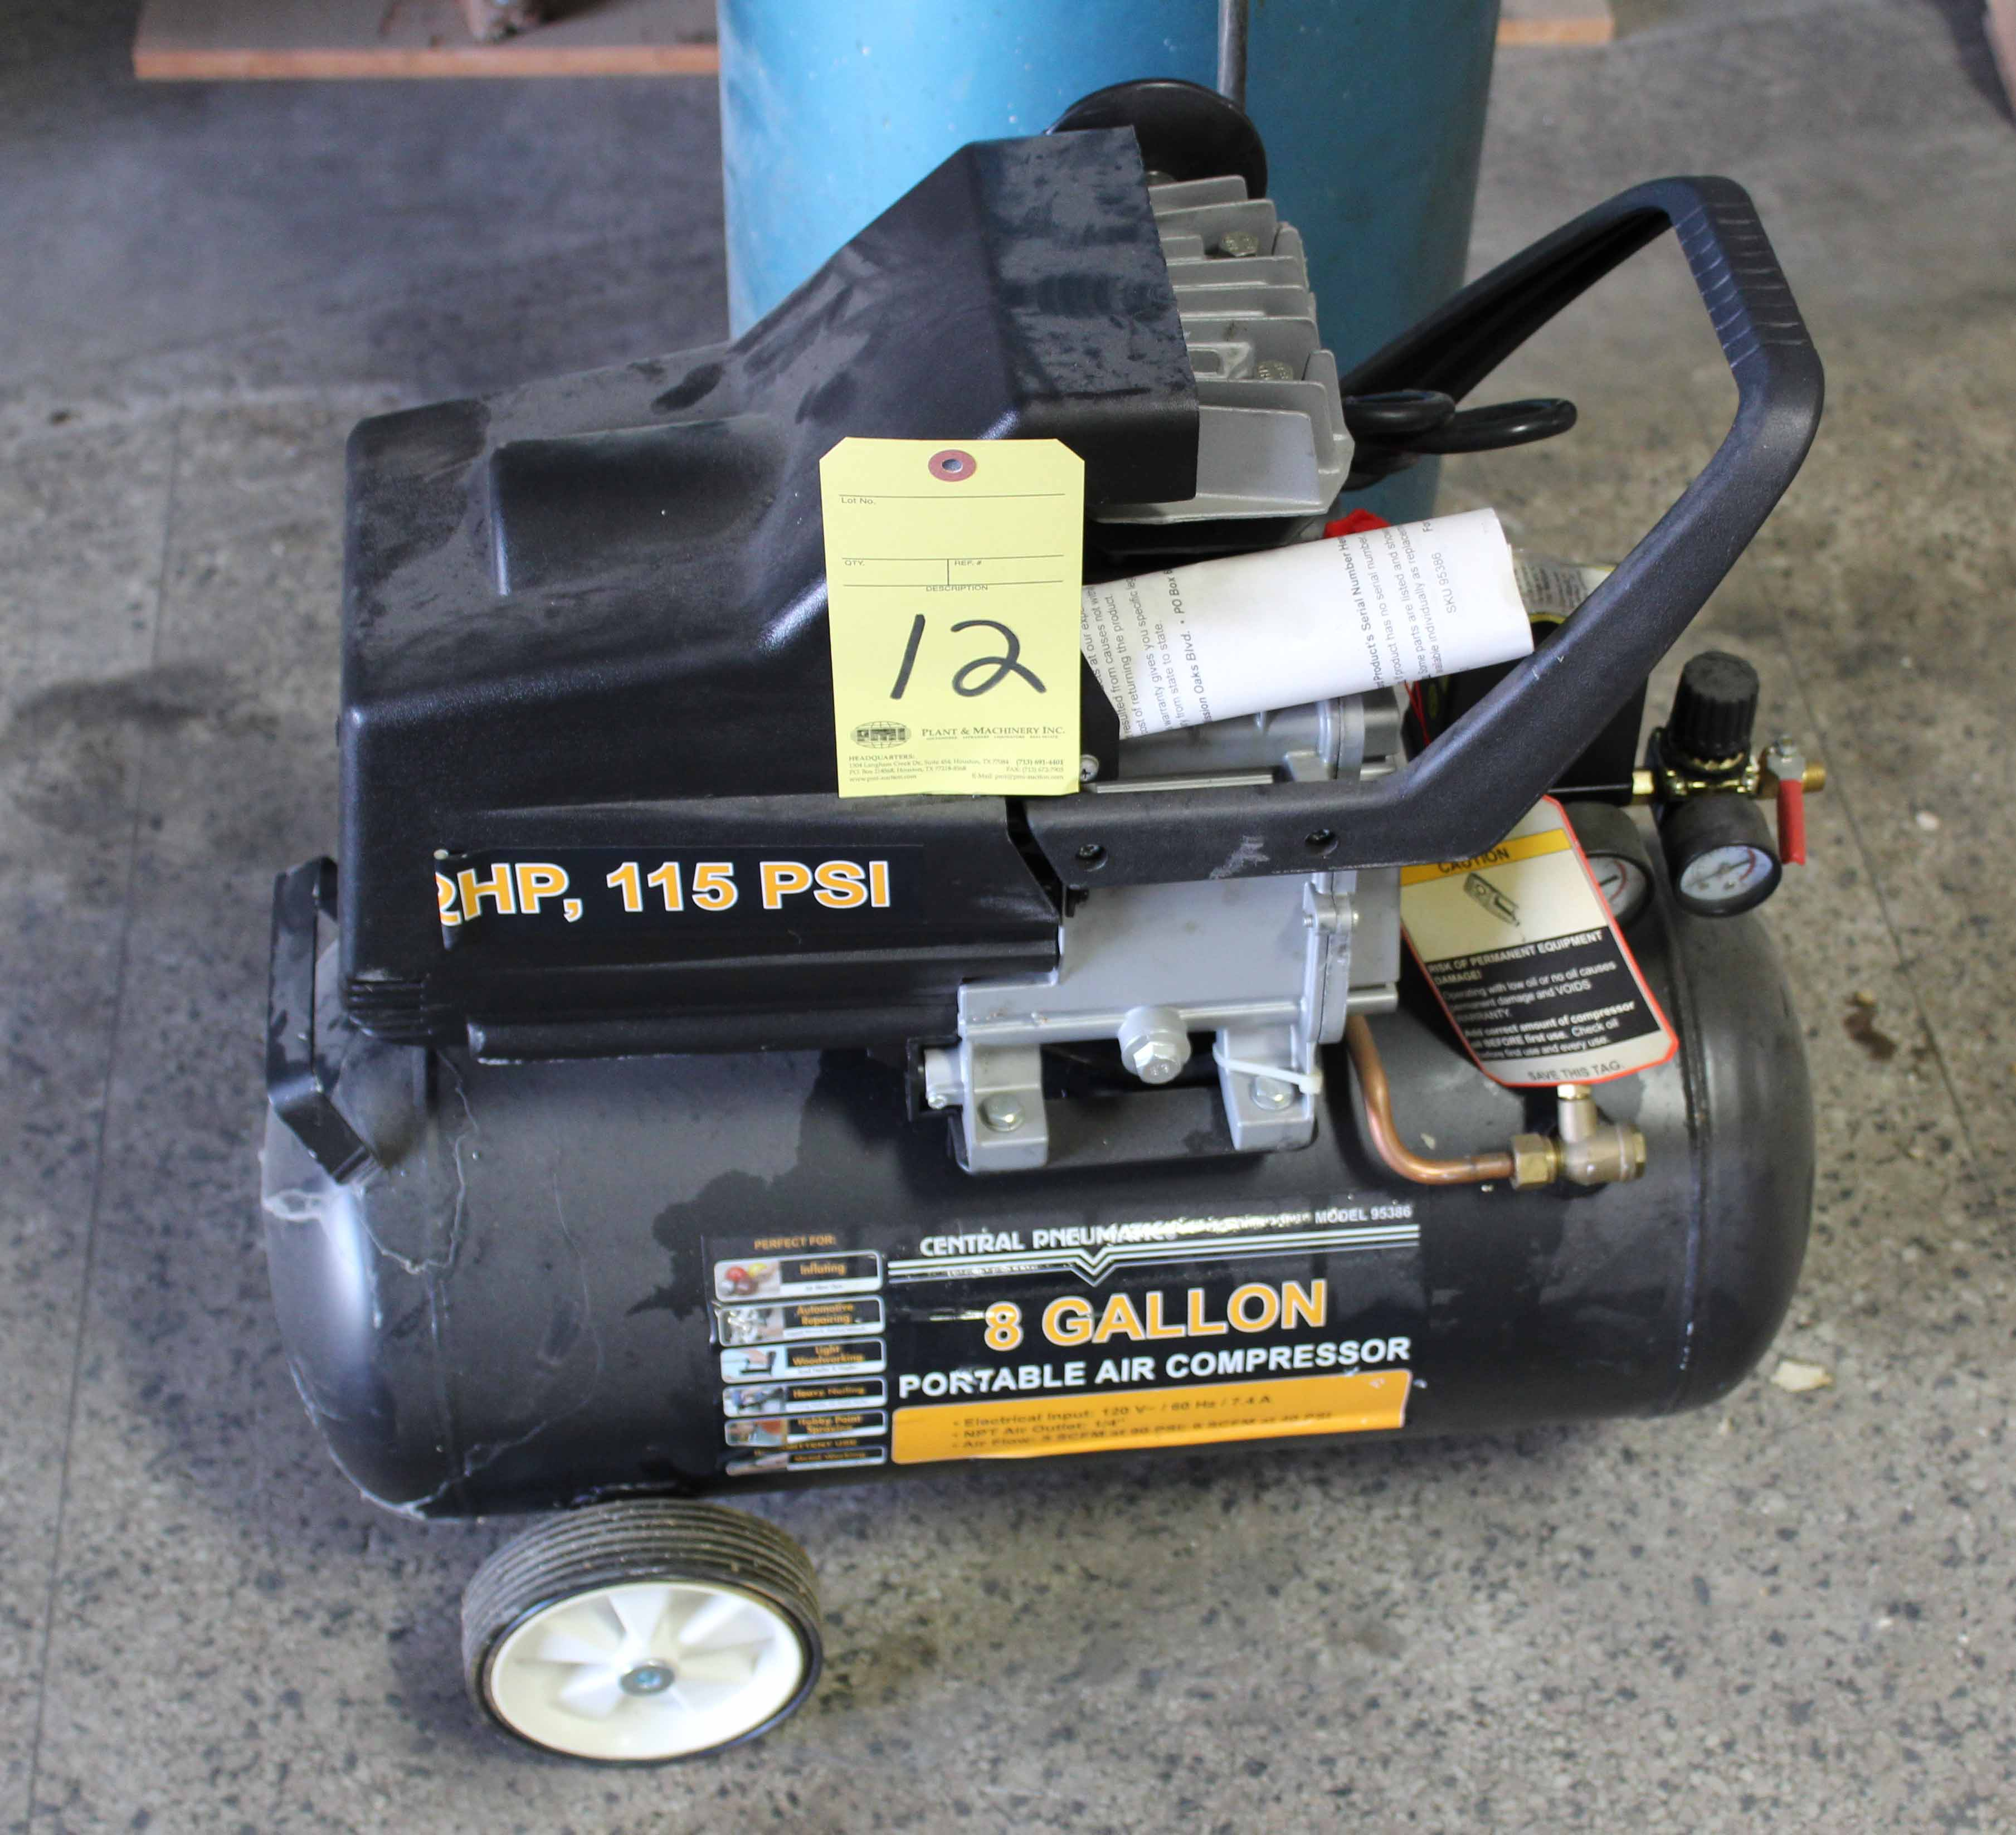 Lot 12 - PORTABLE AIR COMPRESSOR, CENTRAL PNEUMATIC, elec. pwrd., 2 HP motor, 8 gal. horiz. tank